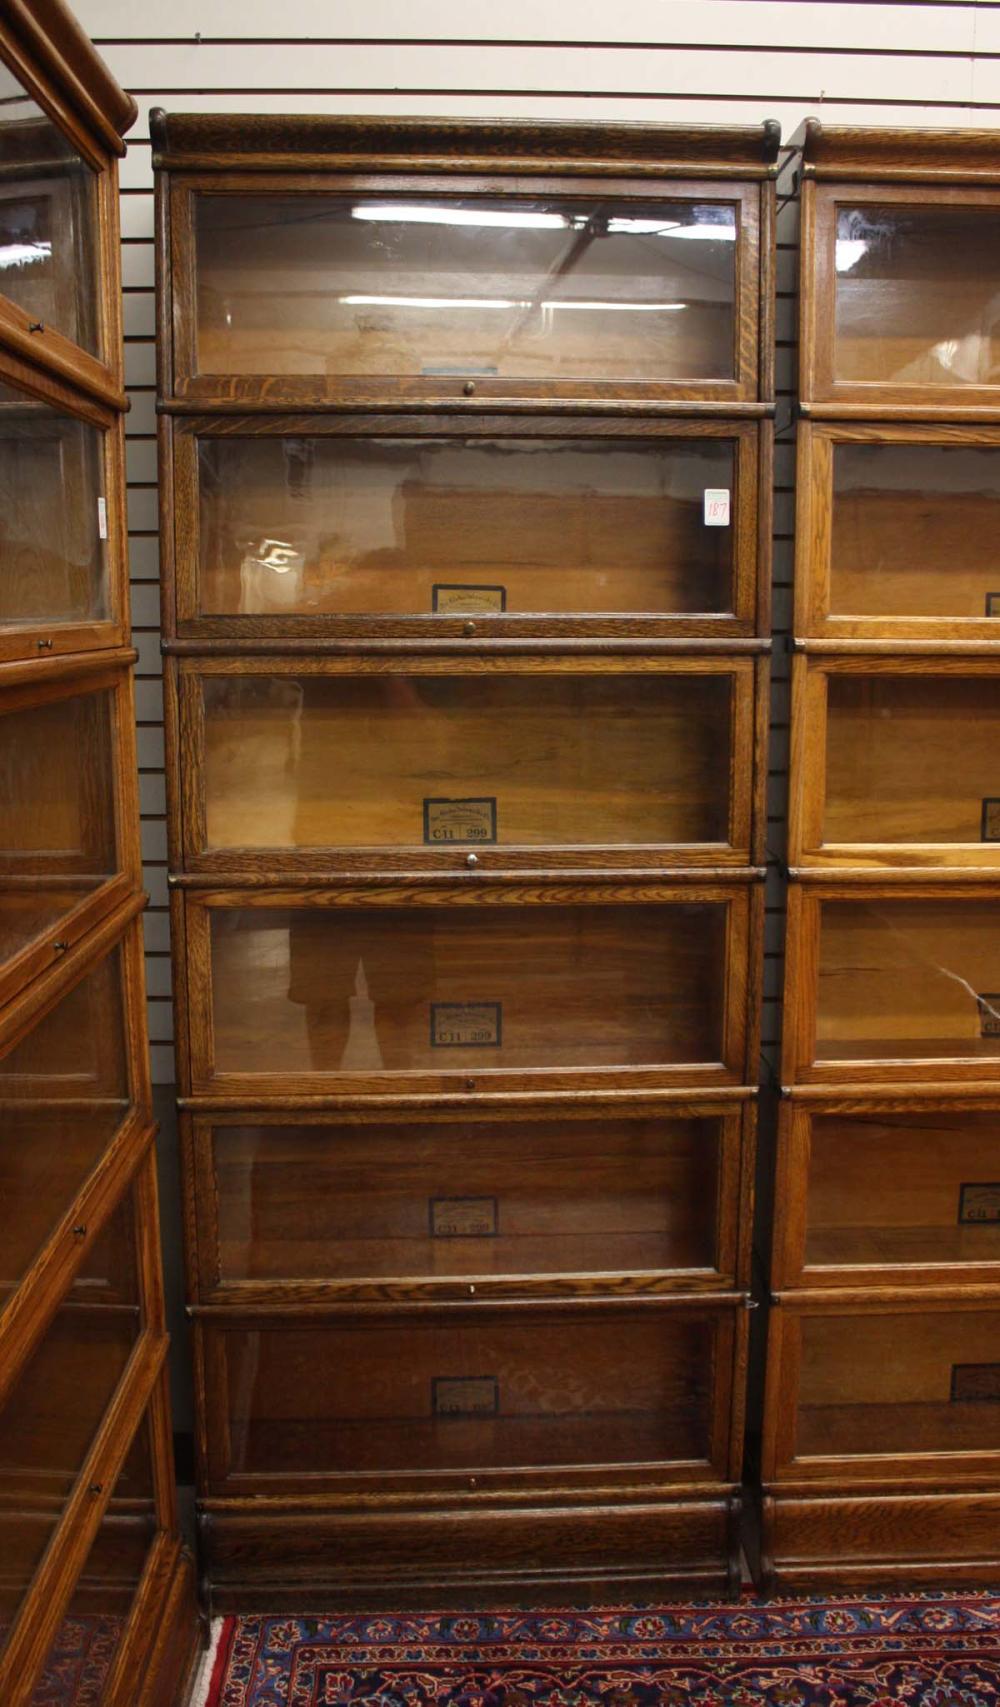 Lot 187: SIX-SECTION STACKING OAK LAWYER BOOKCASE, Globe-We